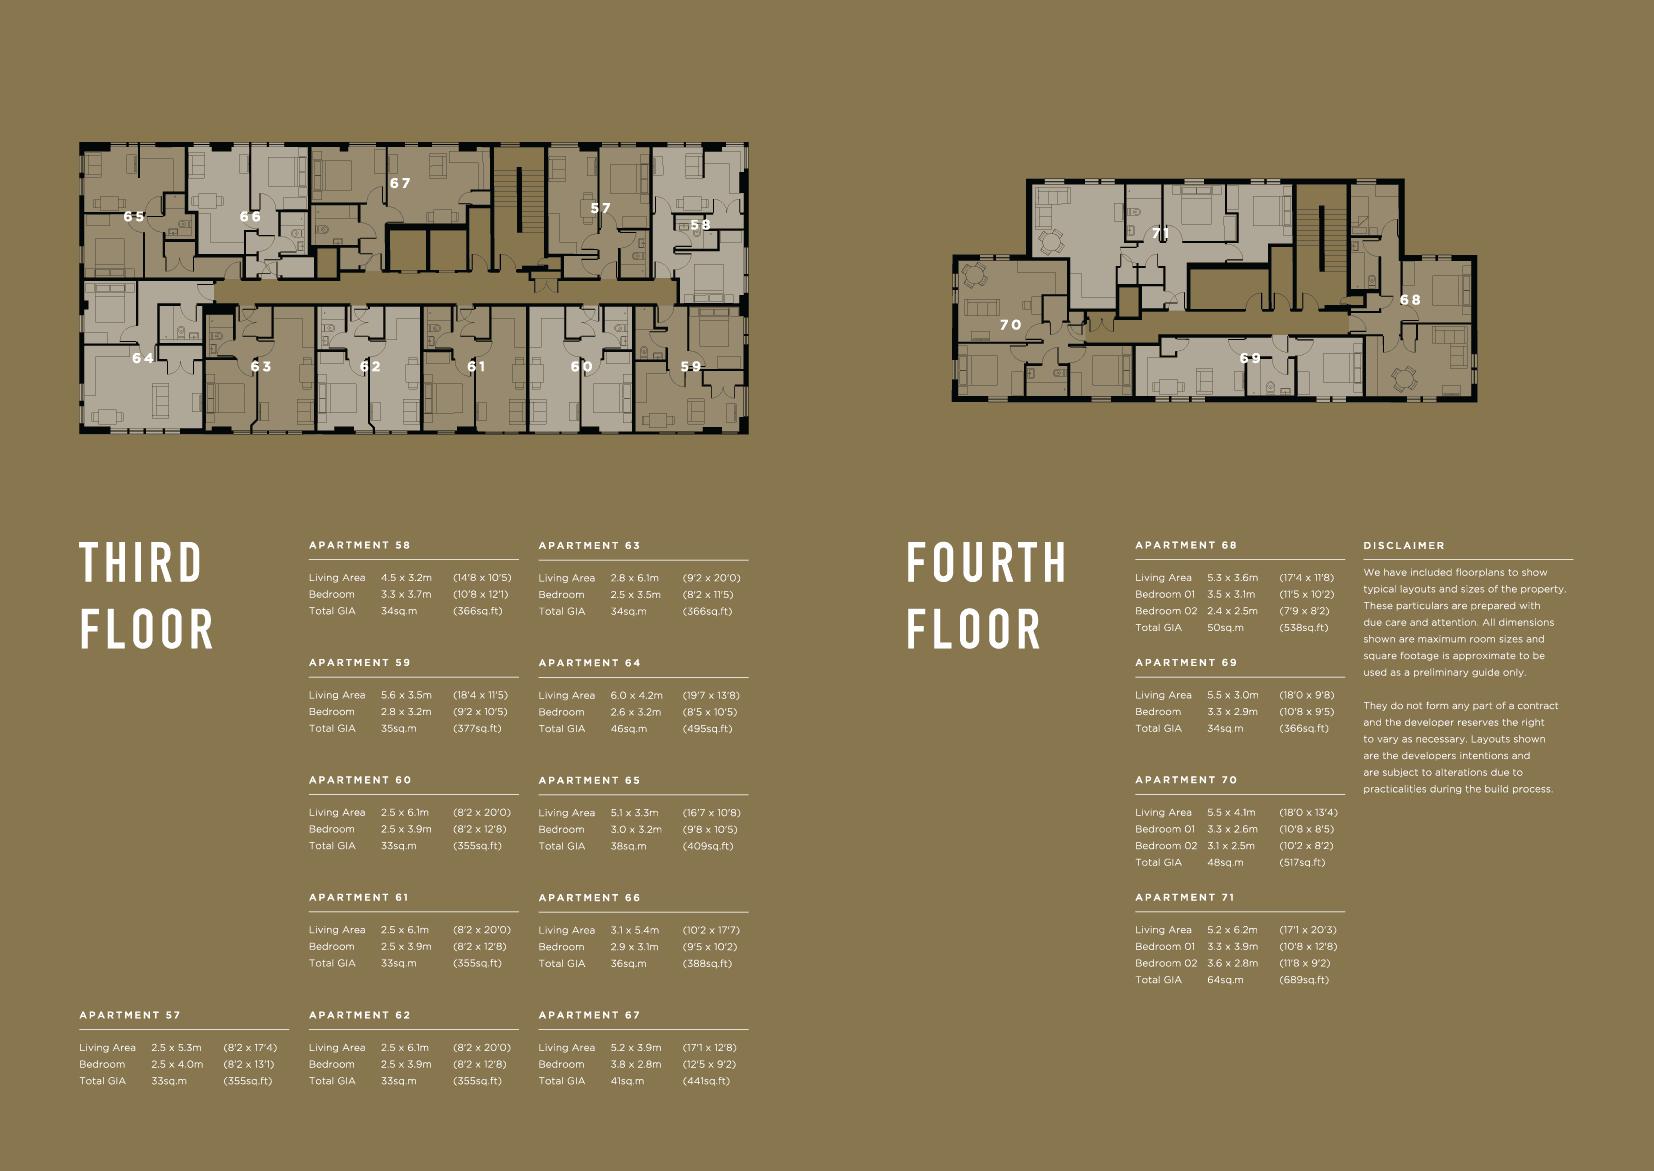 3 & 4 Floor Furness House